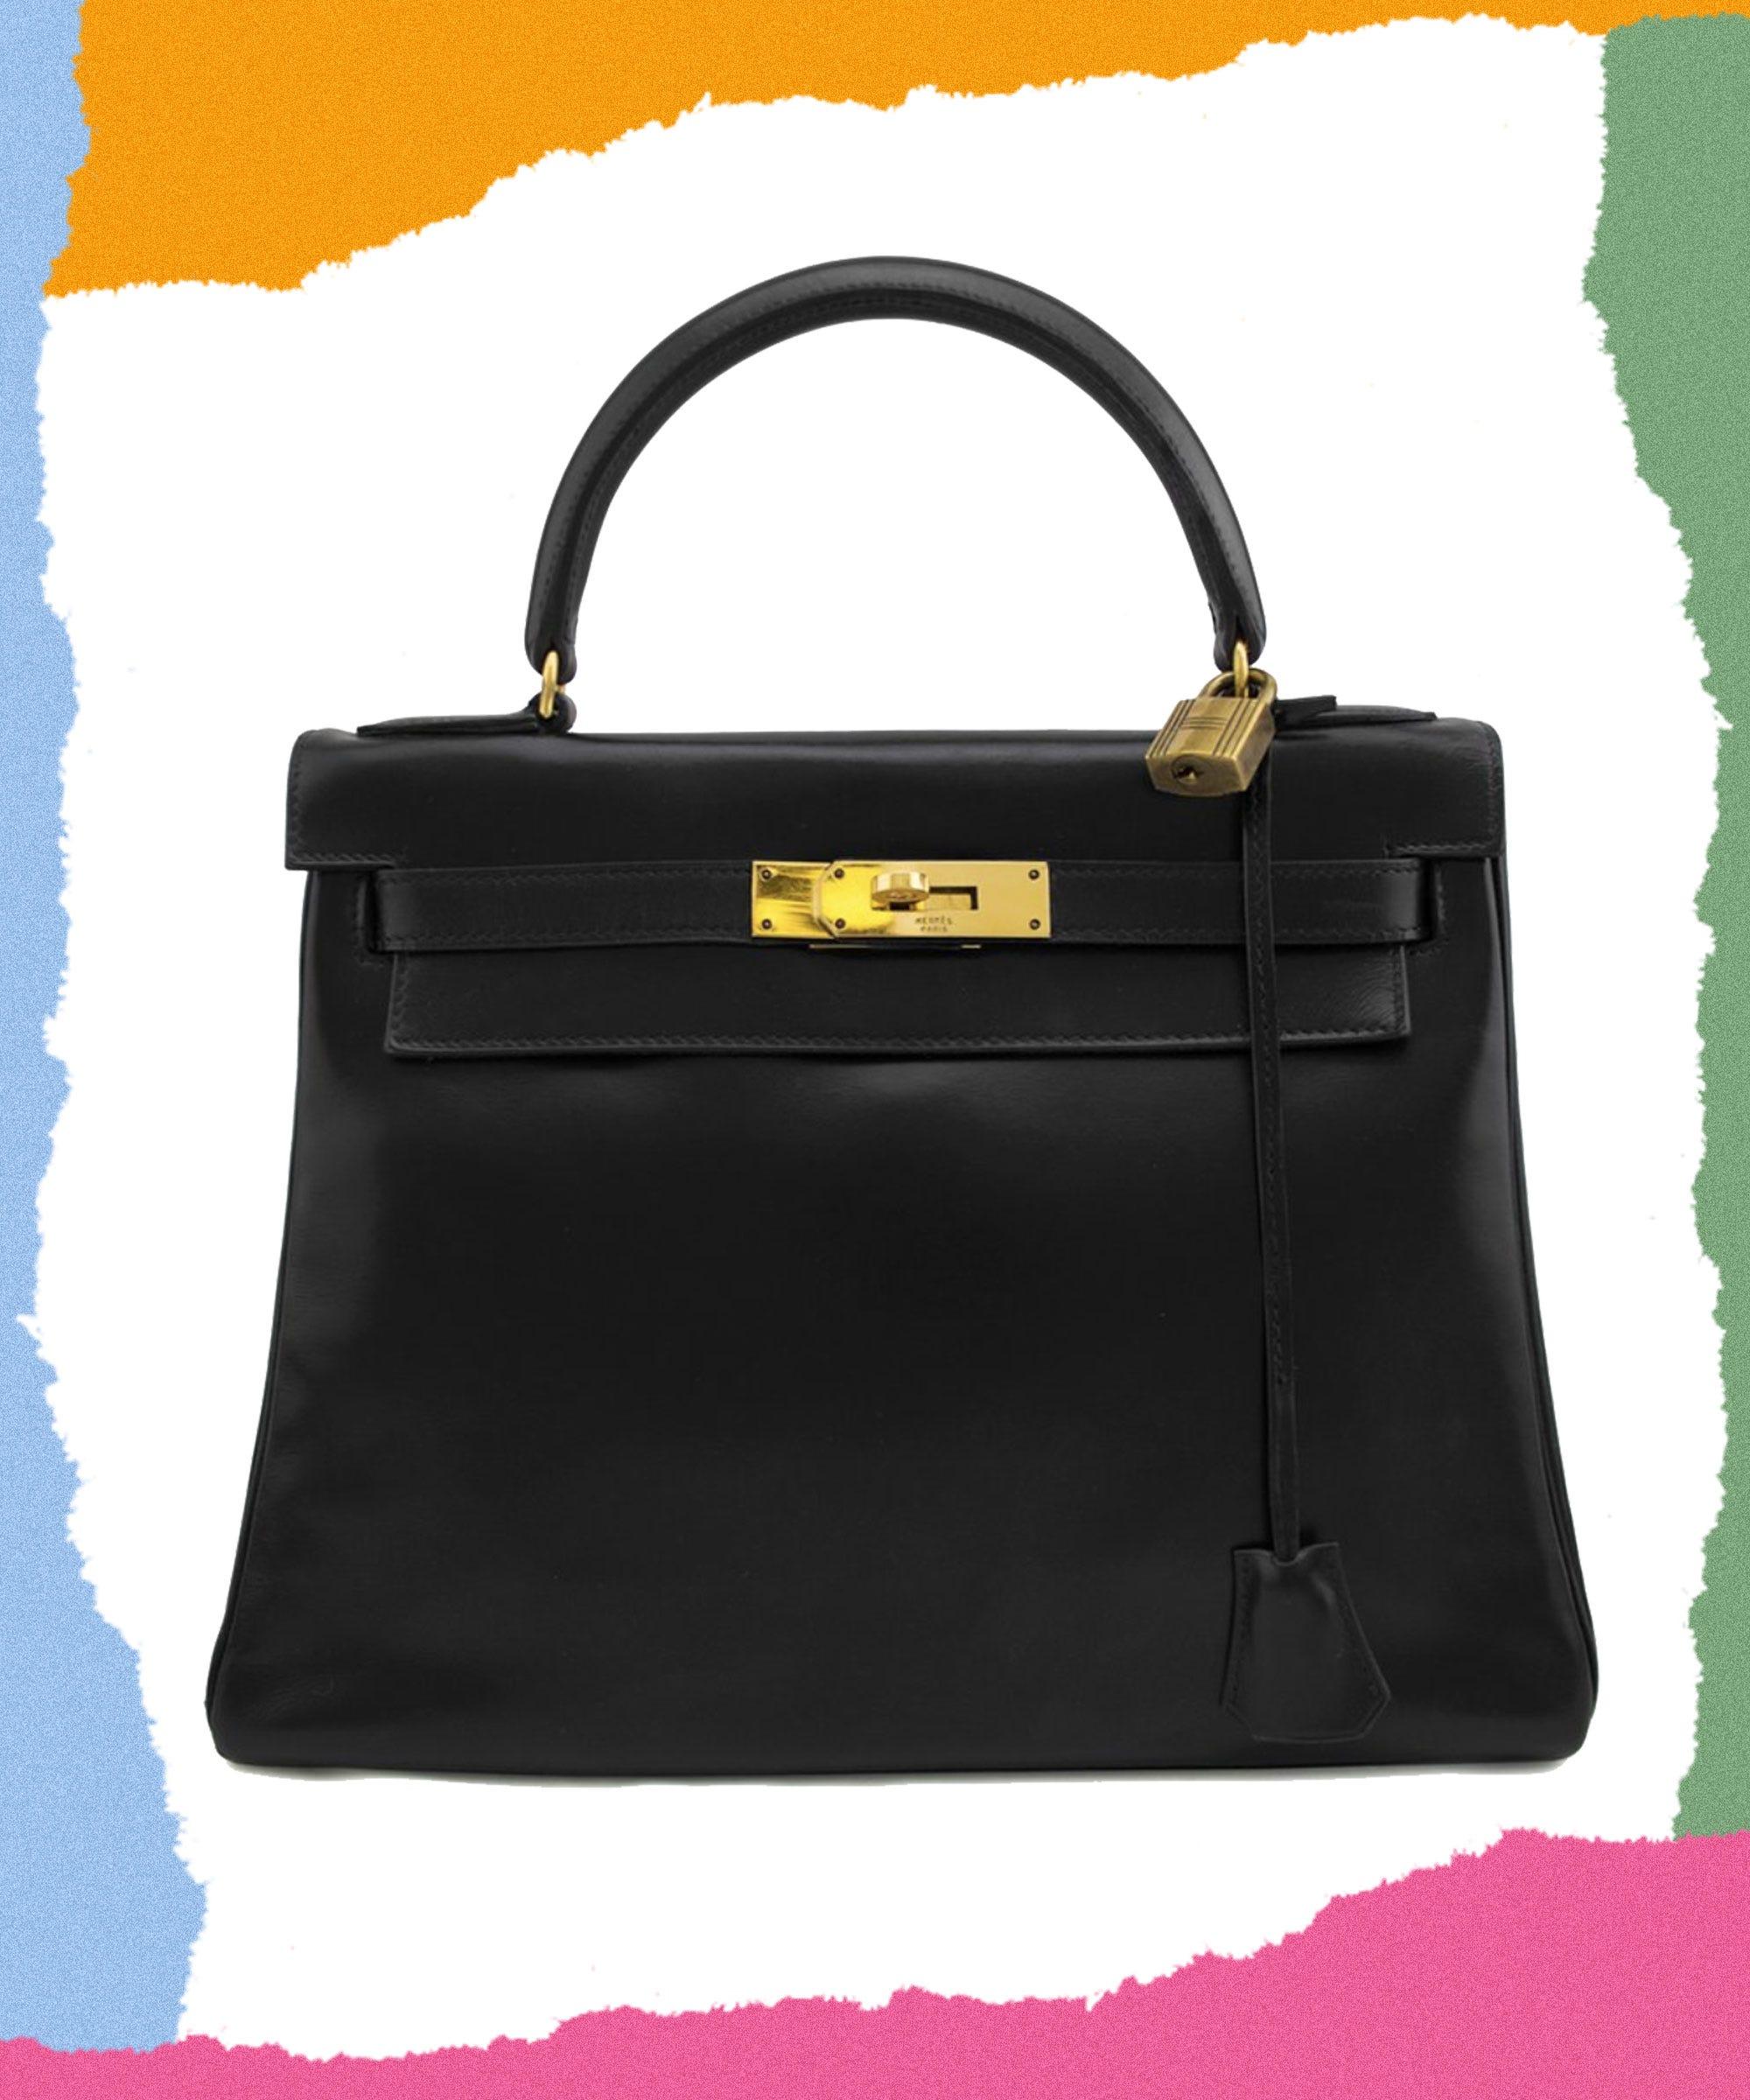 1811e513fb37 Where To Find Vintage Designer Bags Online